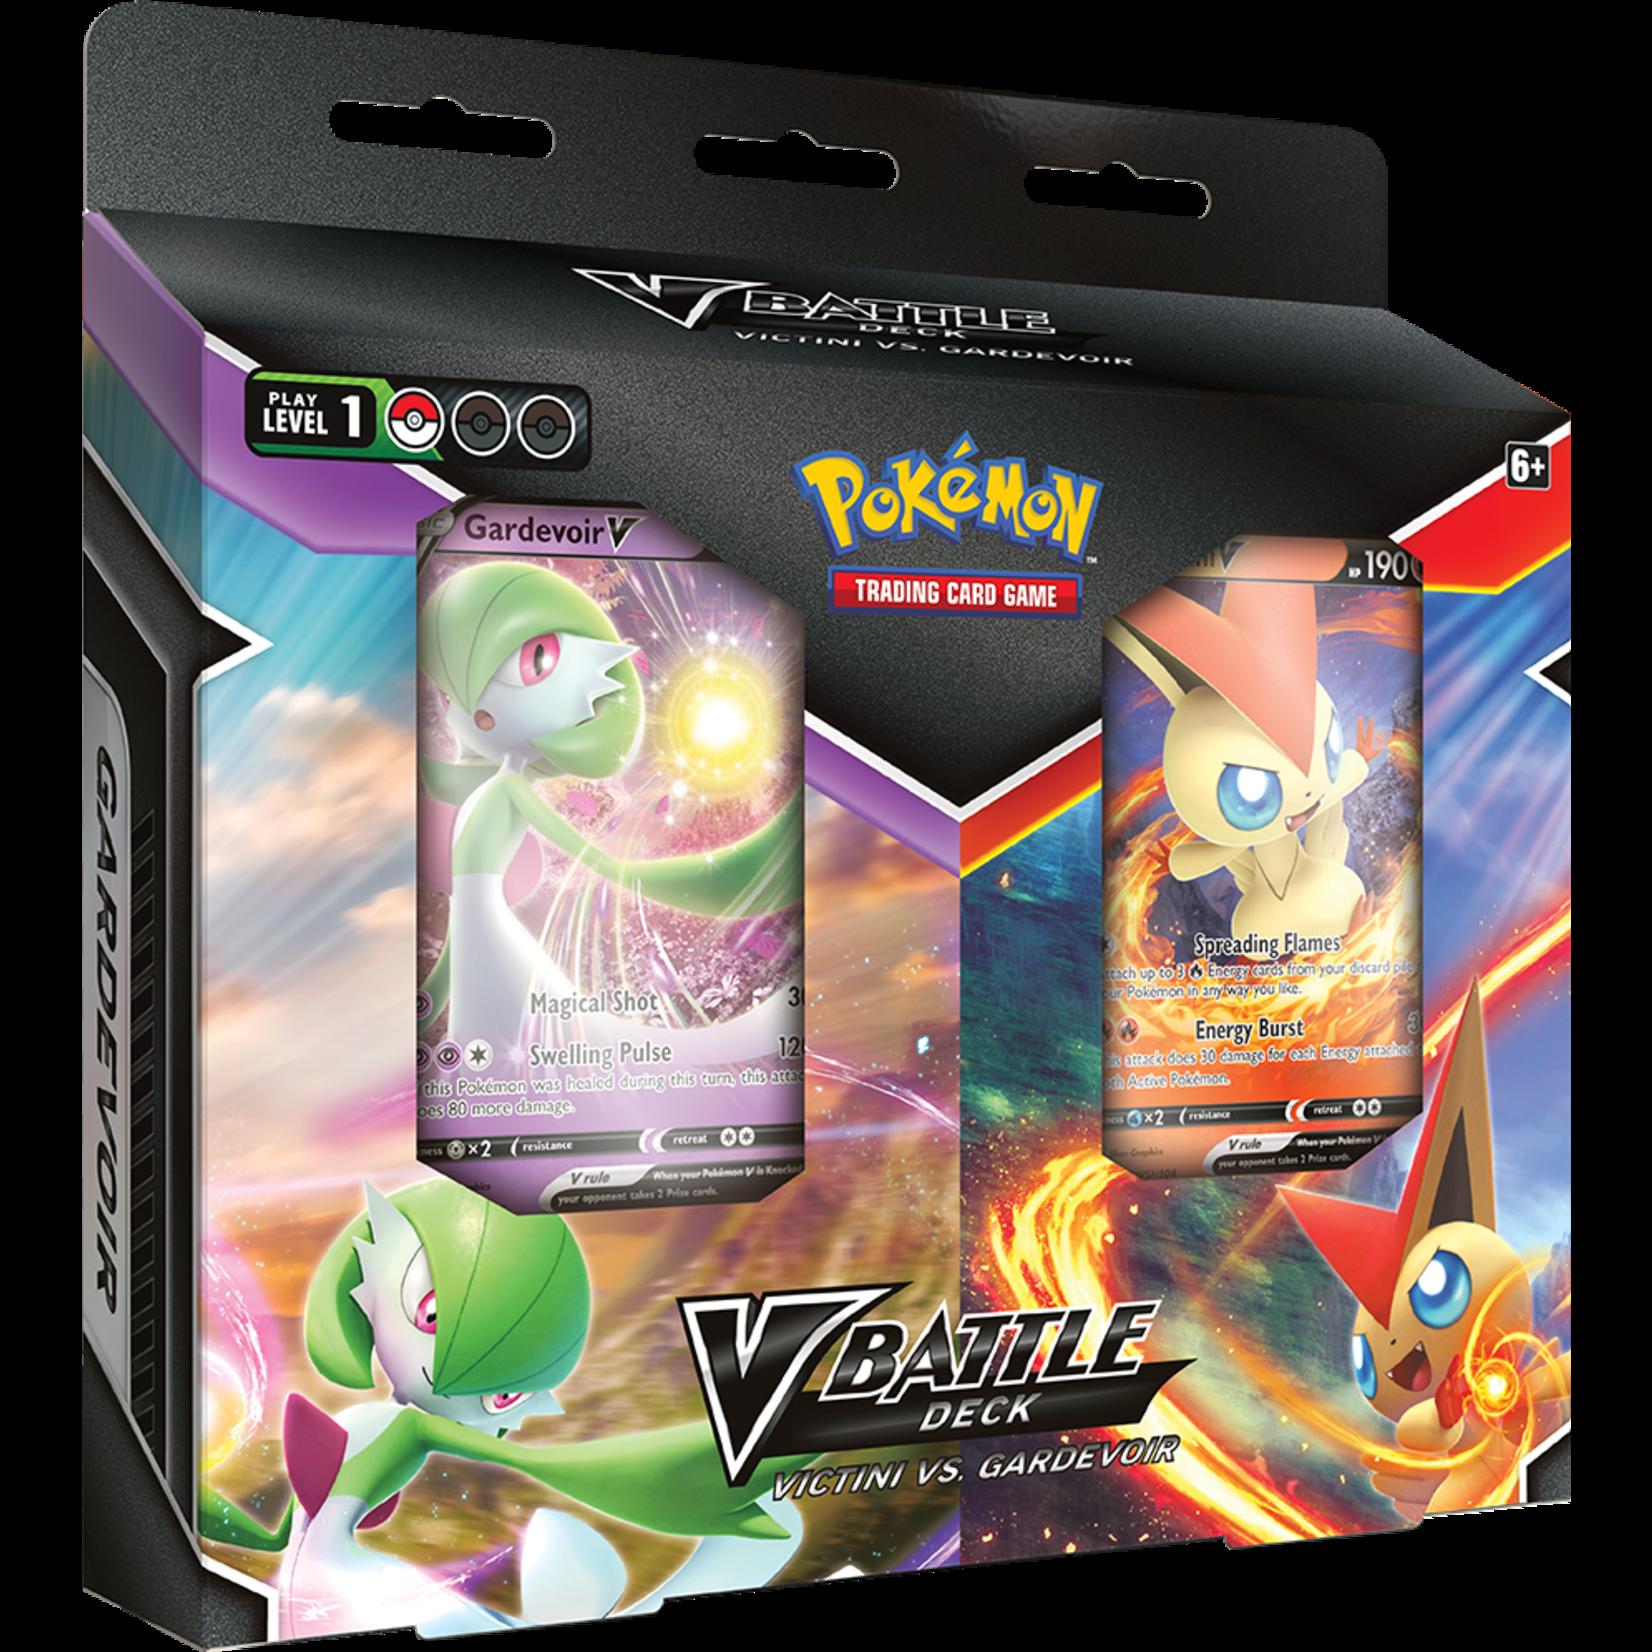 Pokémon Pokémon TCG: V Battle Deck—Victini vs. Gardevoir